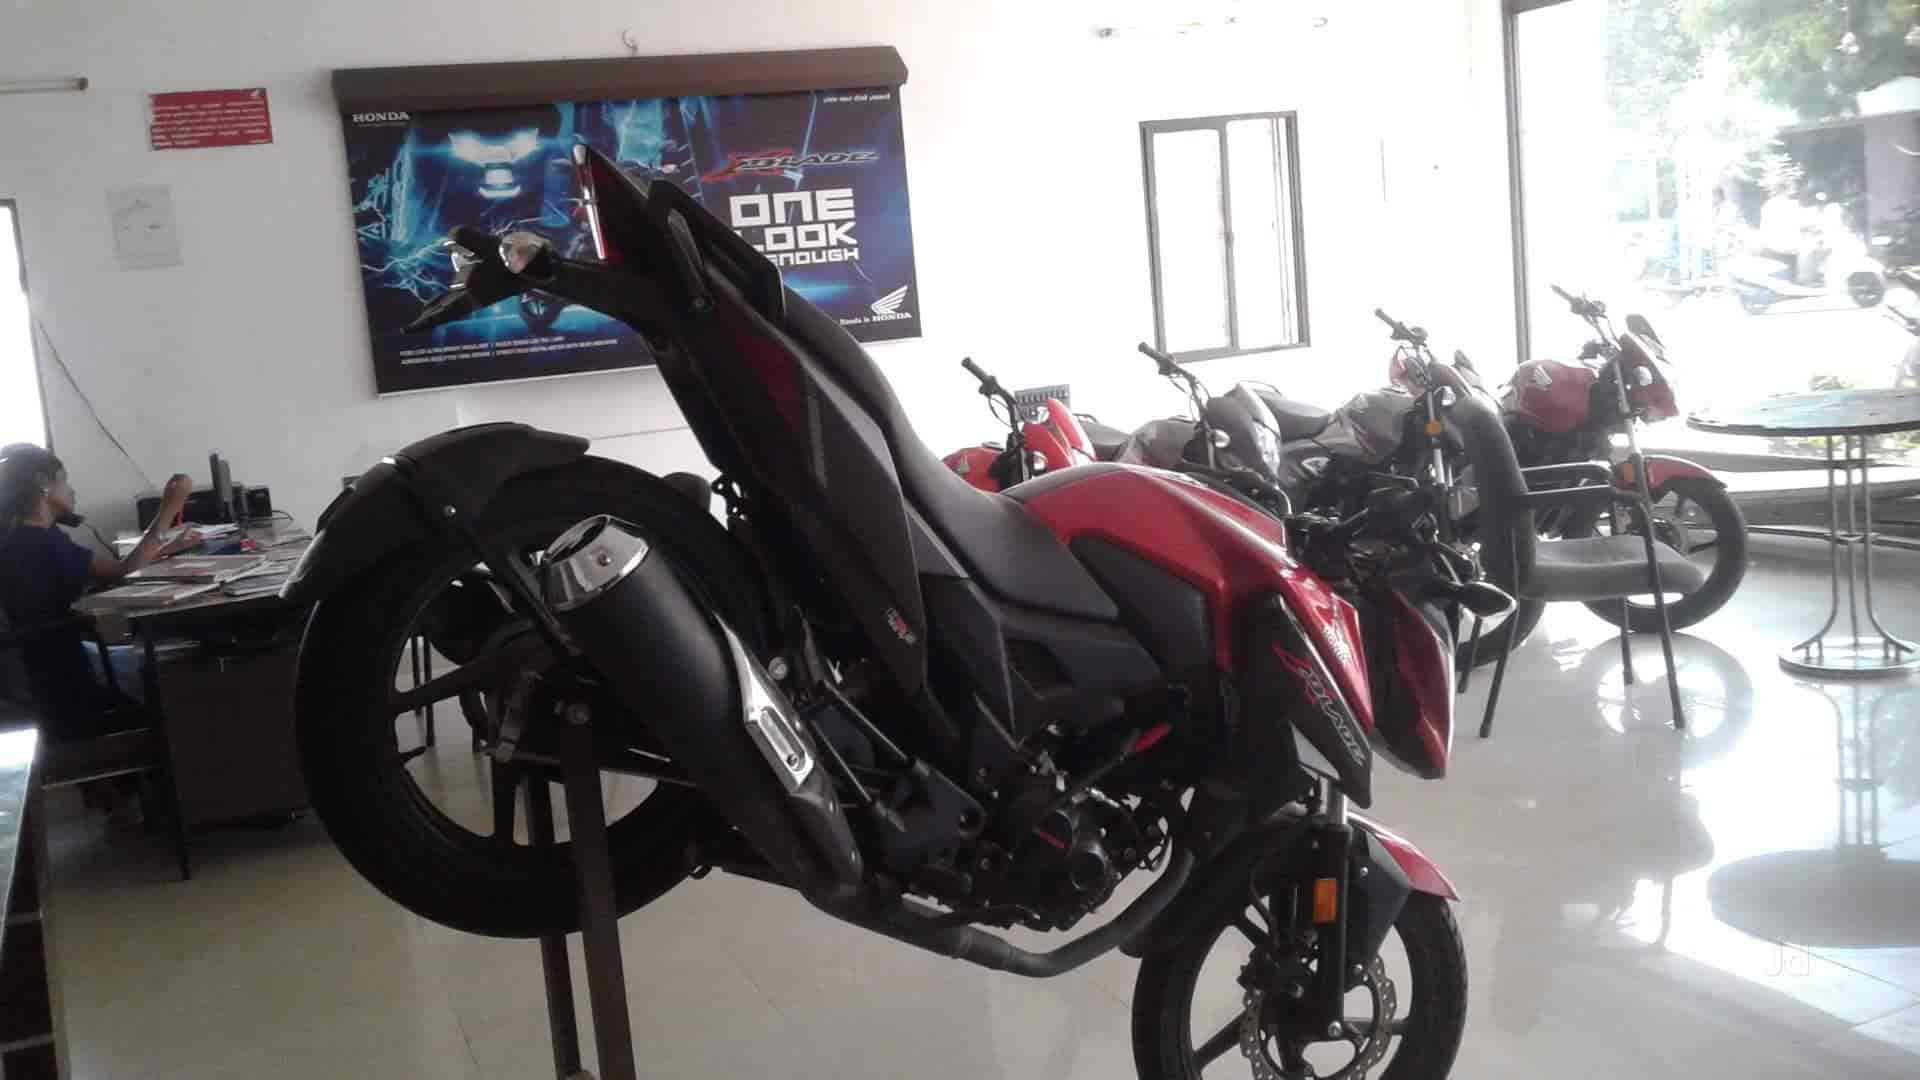 Mech Honda, Pattukottai Ho - Motorcycle Dealers-Honda in Pattukottai